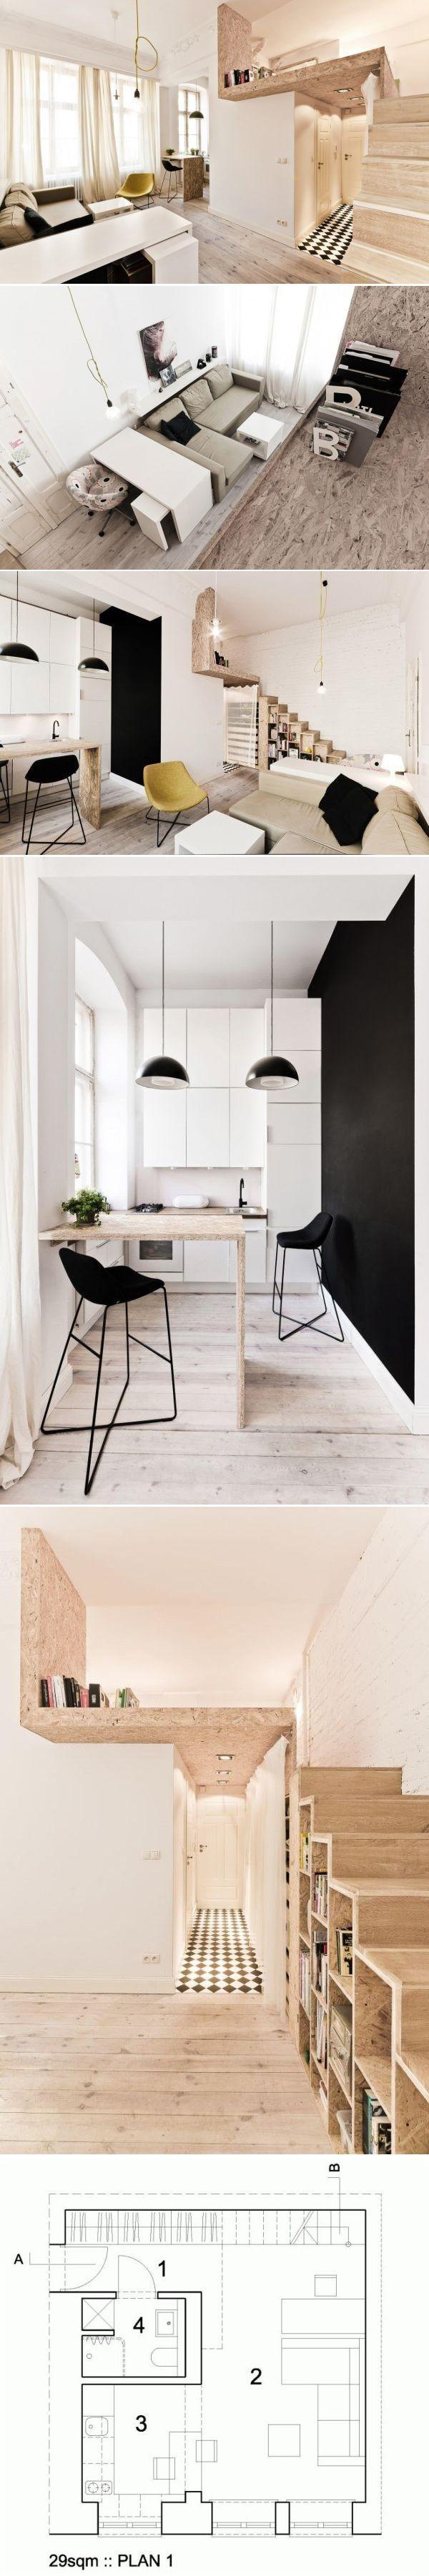 Een efficient ingerichte woning - Makeover.nl